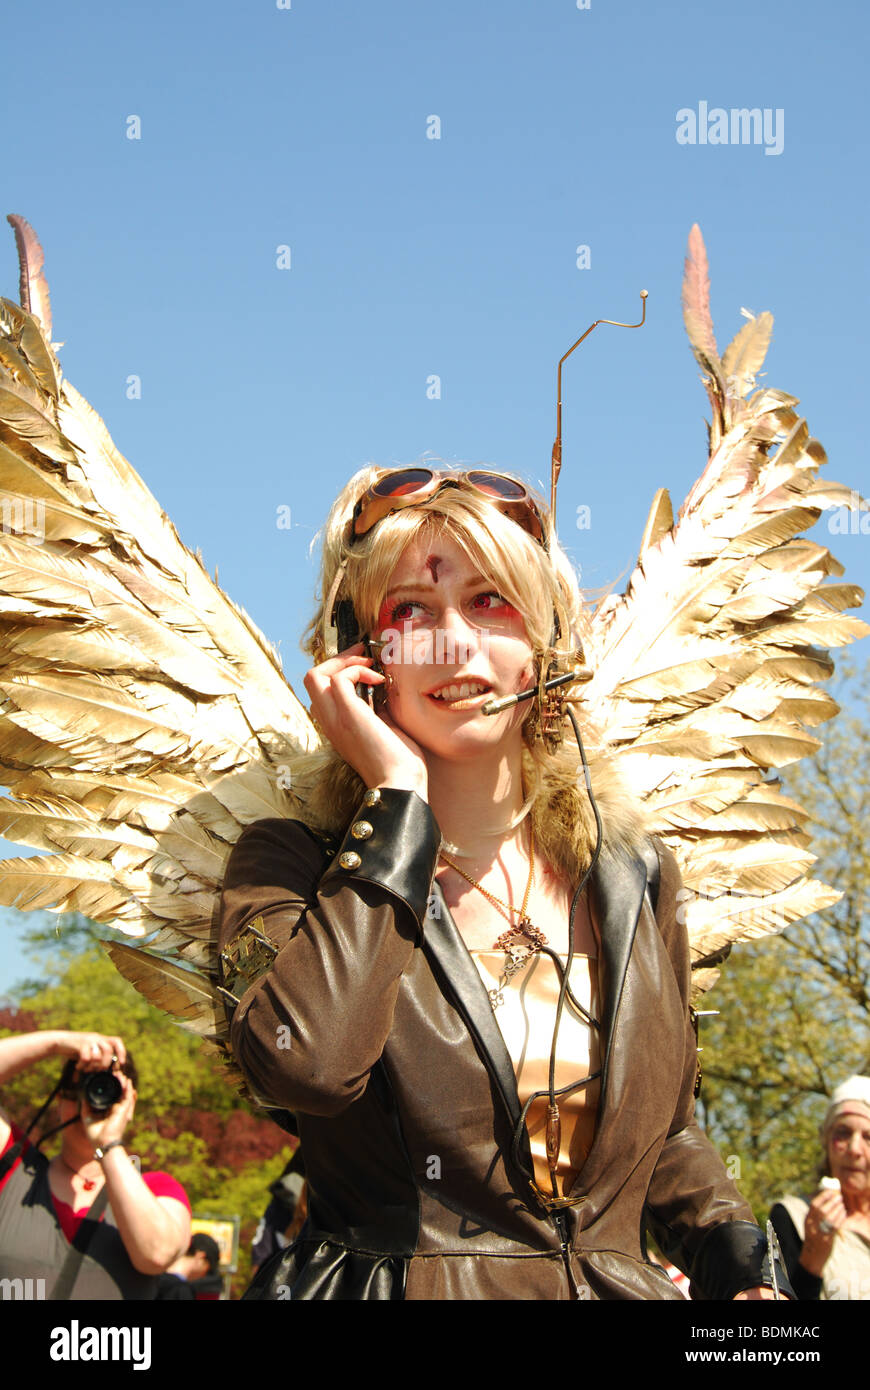 steampunk woman at 2009 Fantasy Fair Haarzuilens Netherlands Europe - Stock Image